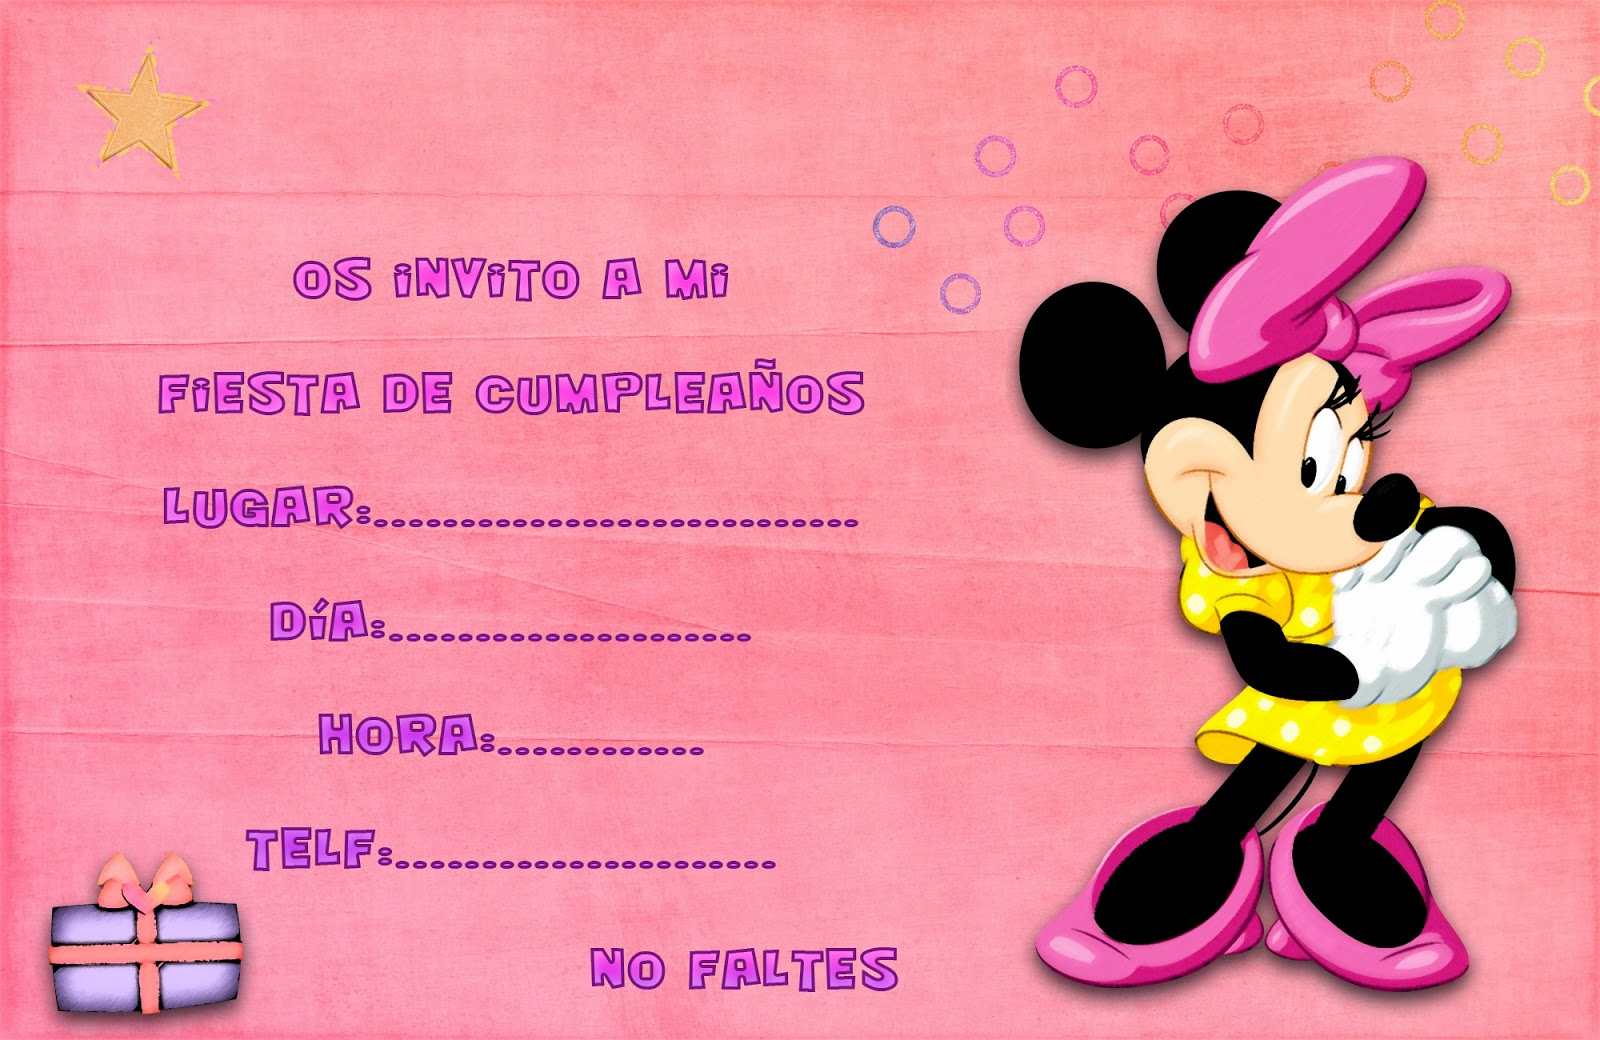 Tarjeta Para Invitaciones De Cumpleanos Minnie Invitaciones Gratis - Tarjetas-de-invitacion-cumpleaos